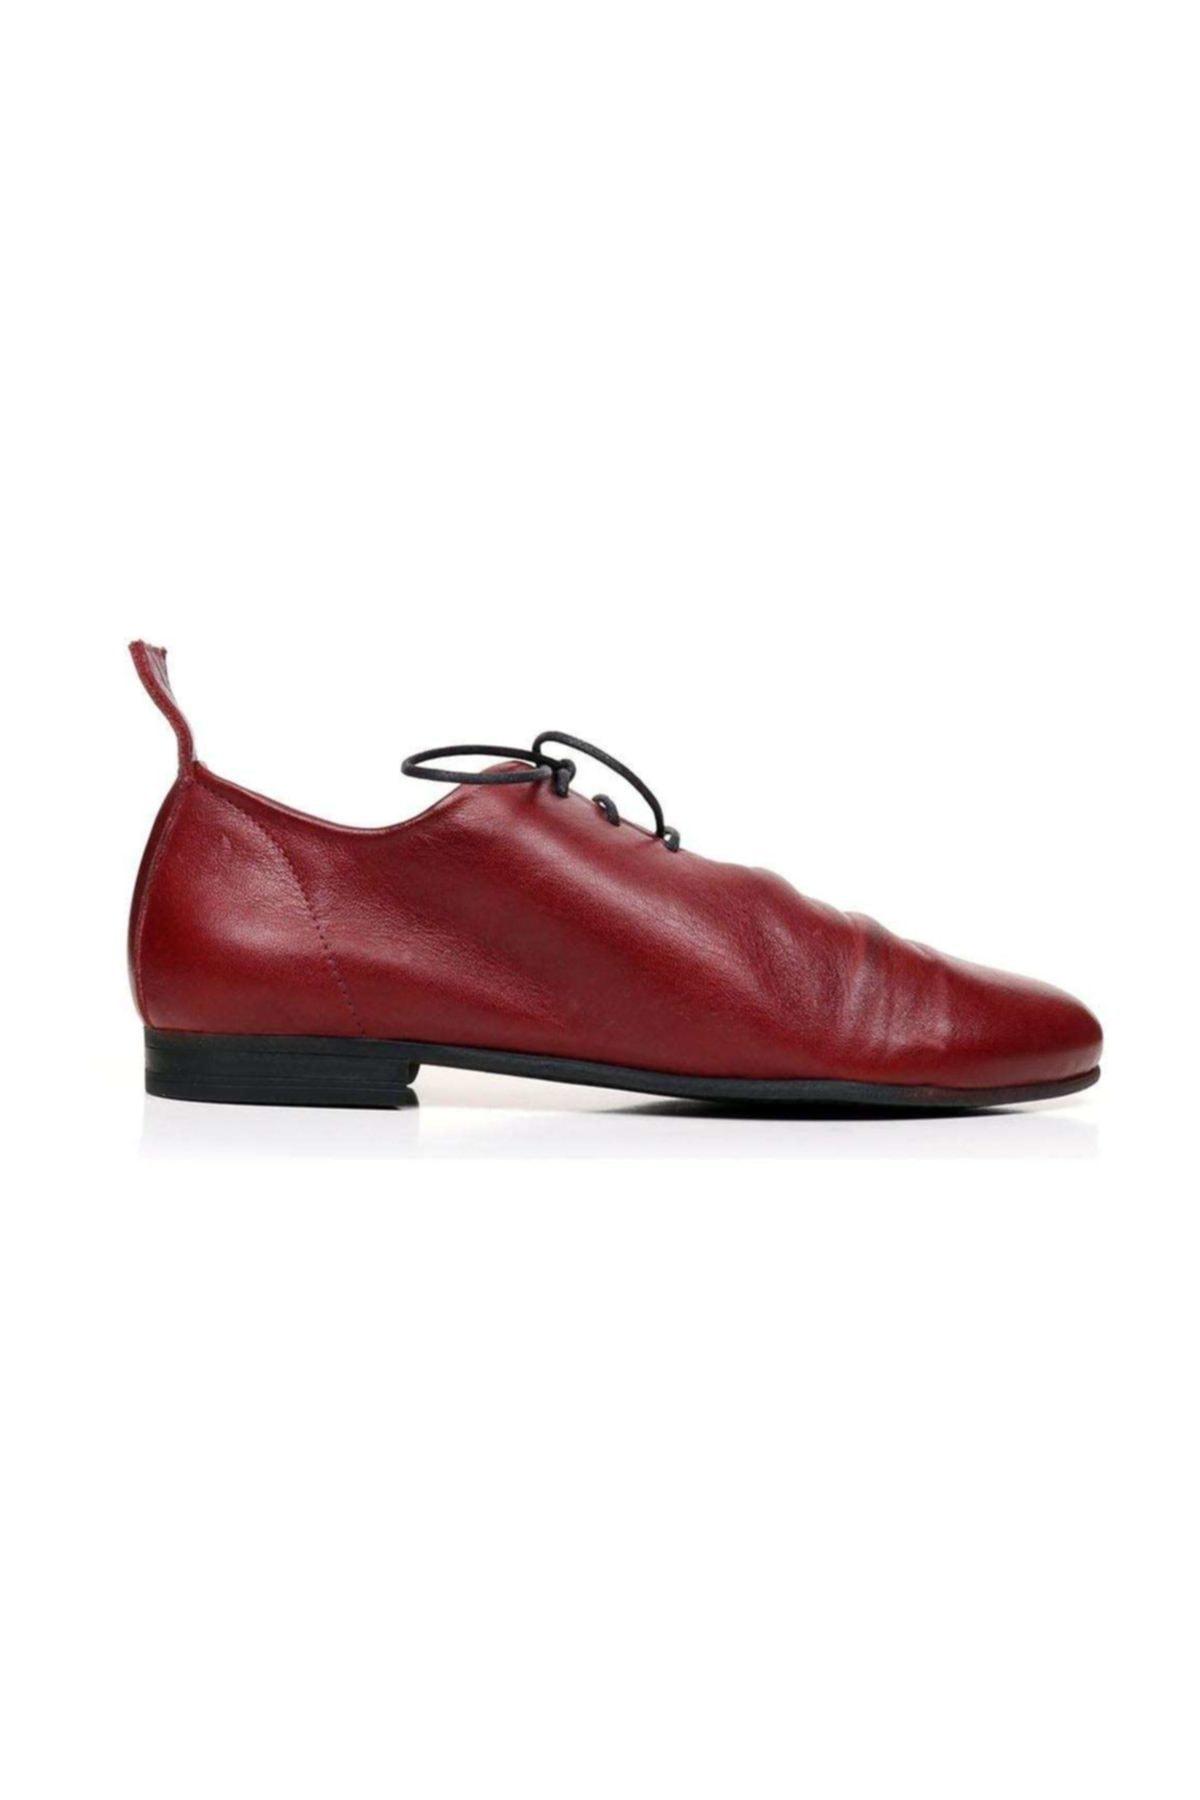 BUENO Shoes Kadın Ayakkabı 9p5914 1